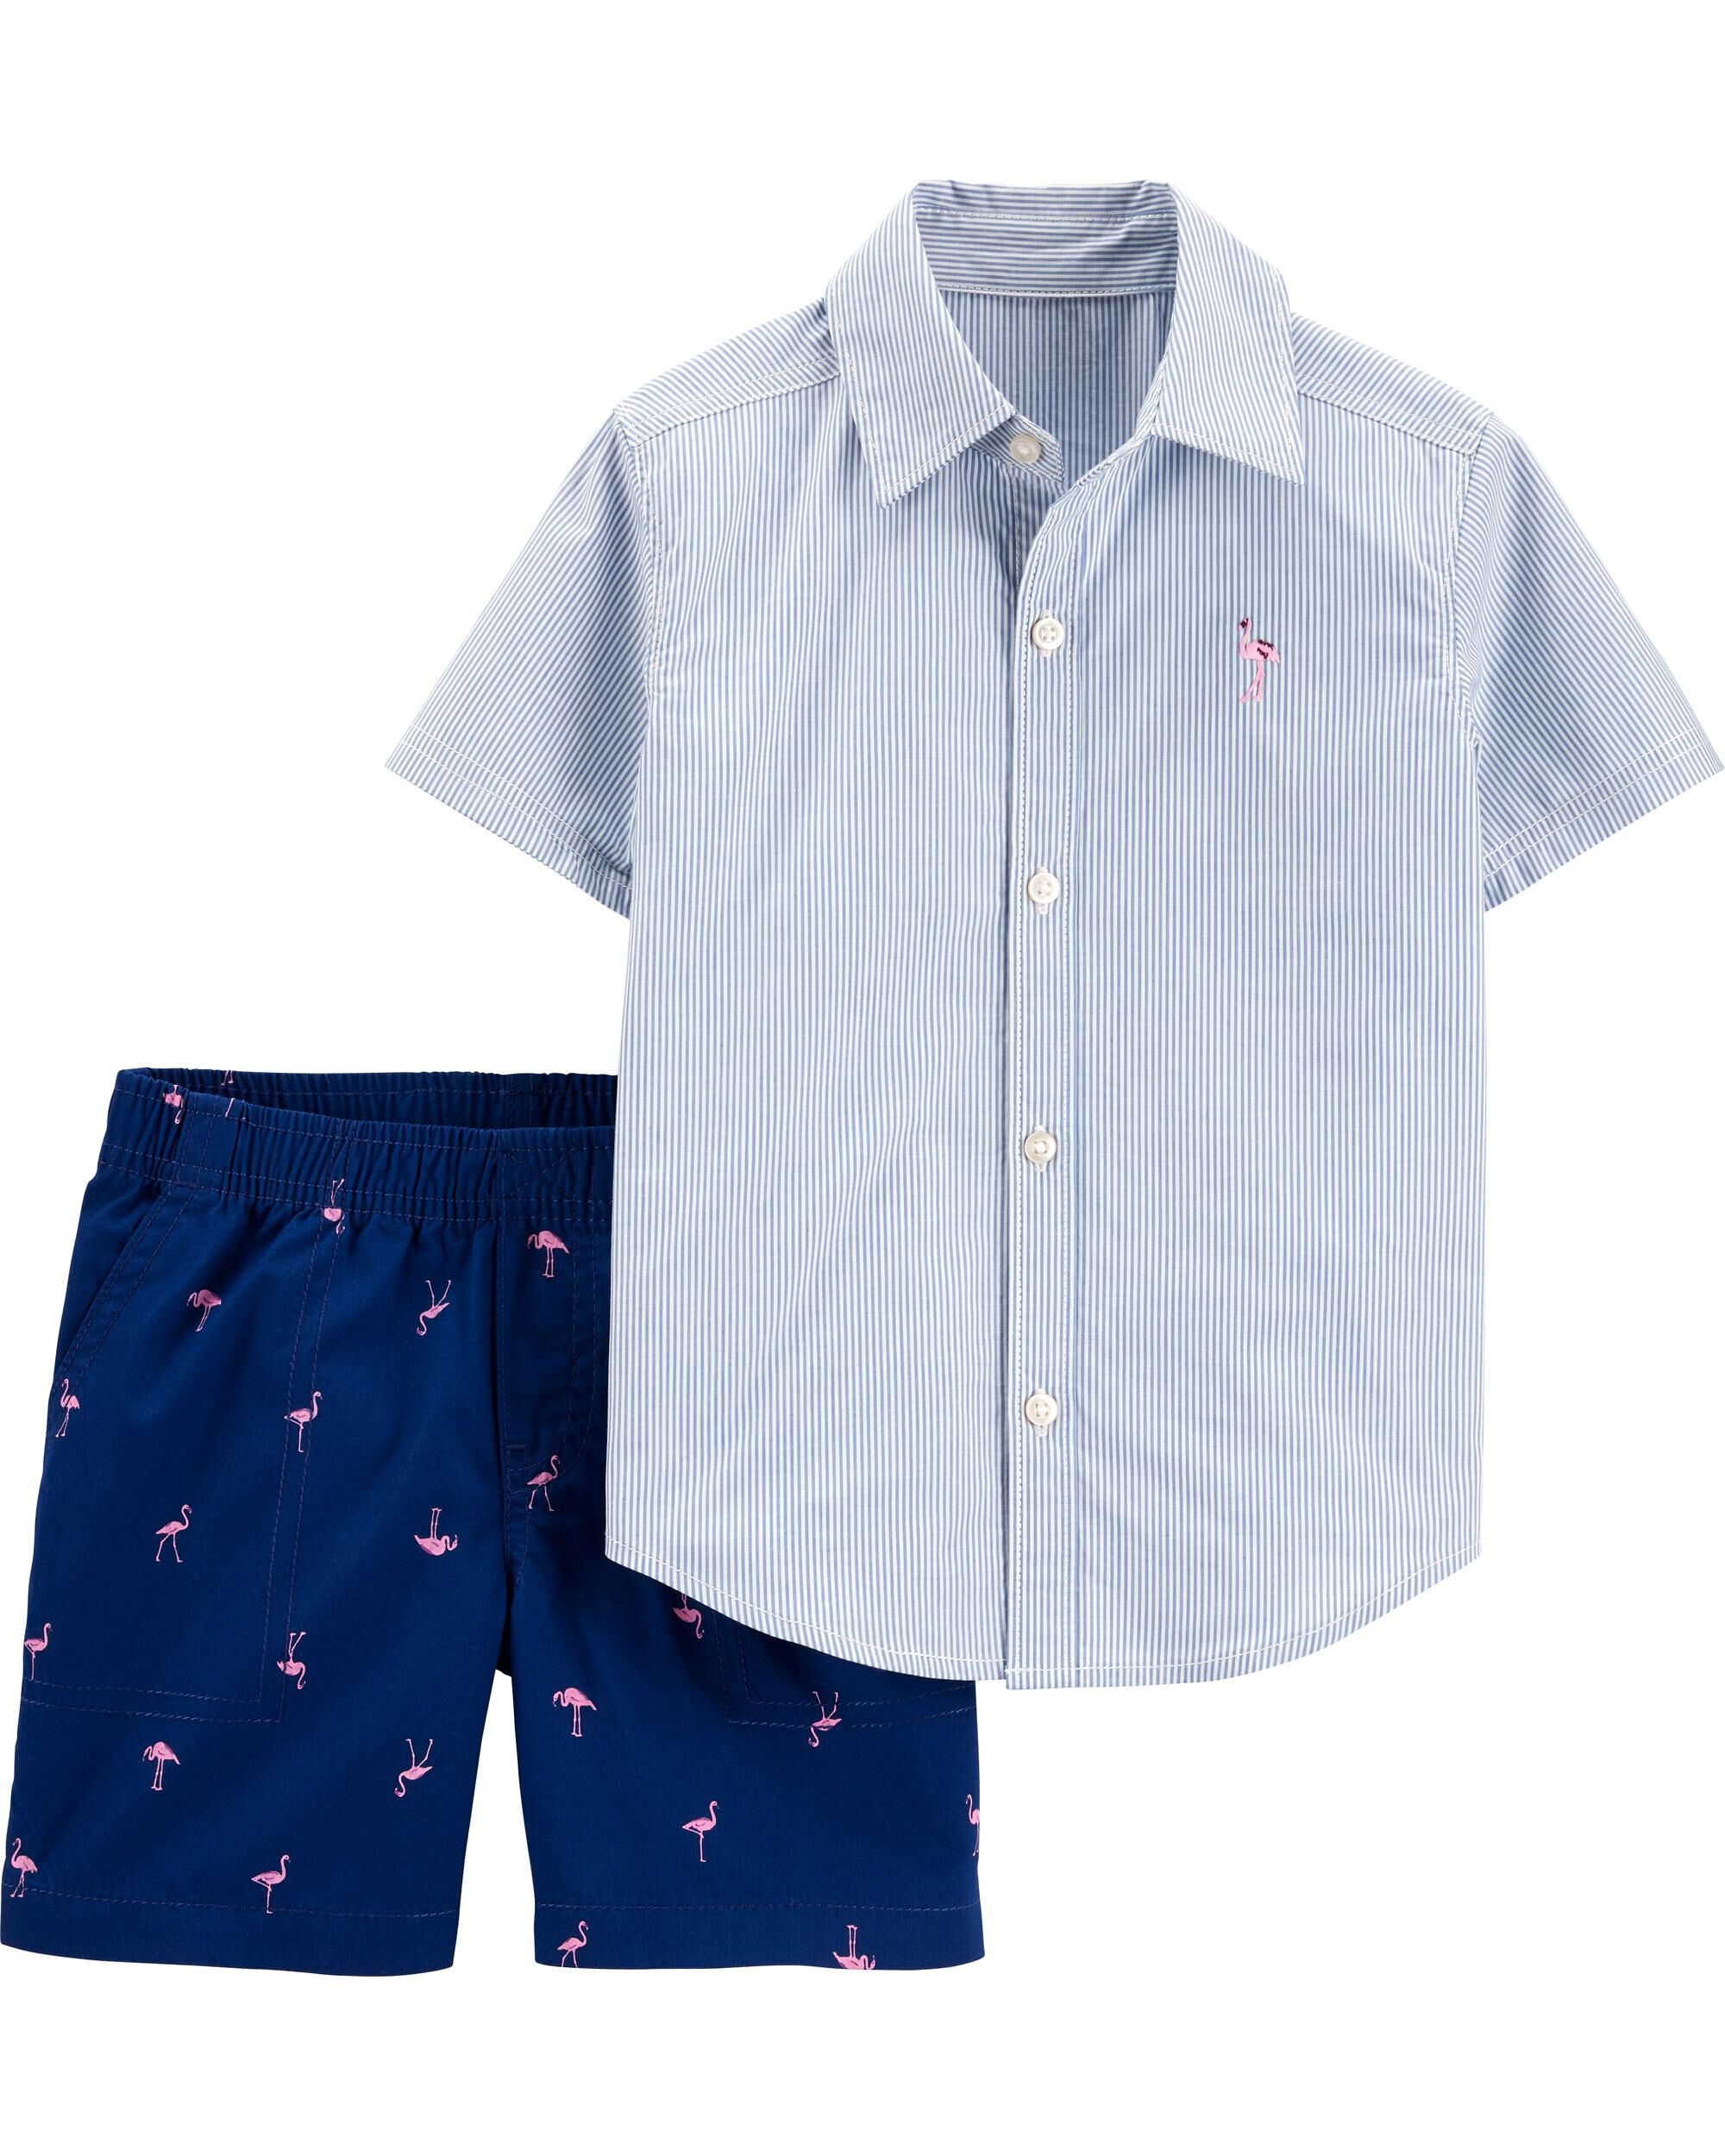 *DOORBUSTER* 2-Piece Striped Button-Front Shirt & Flamingo Short Set